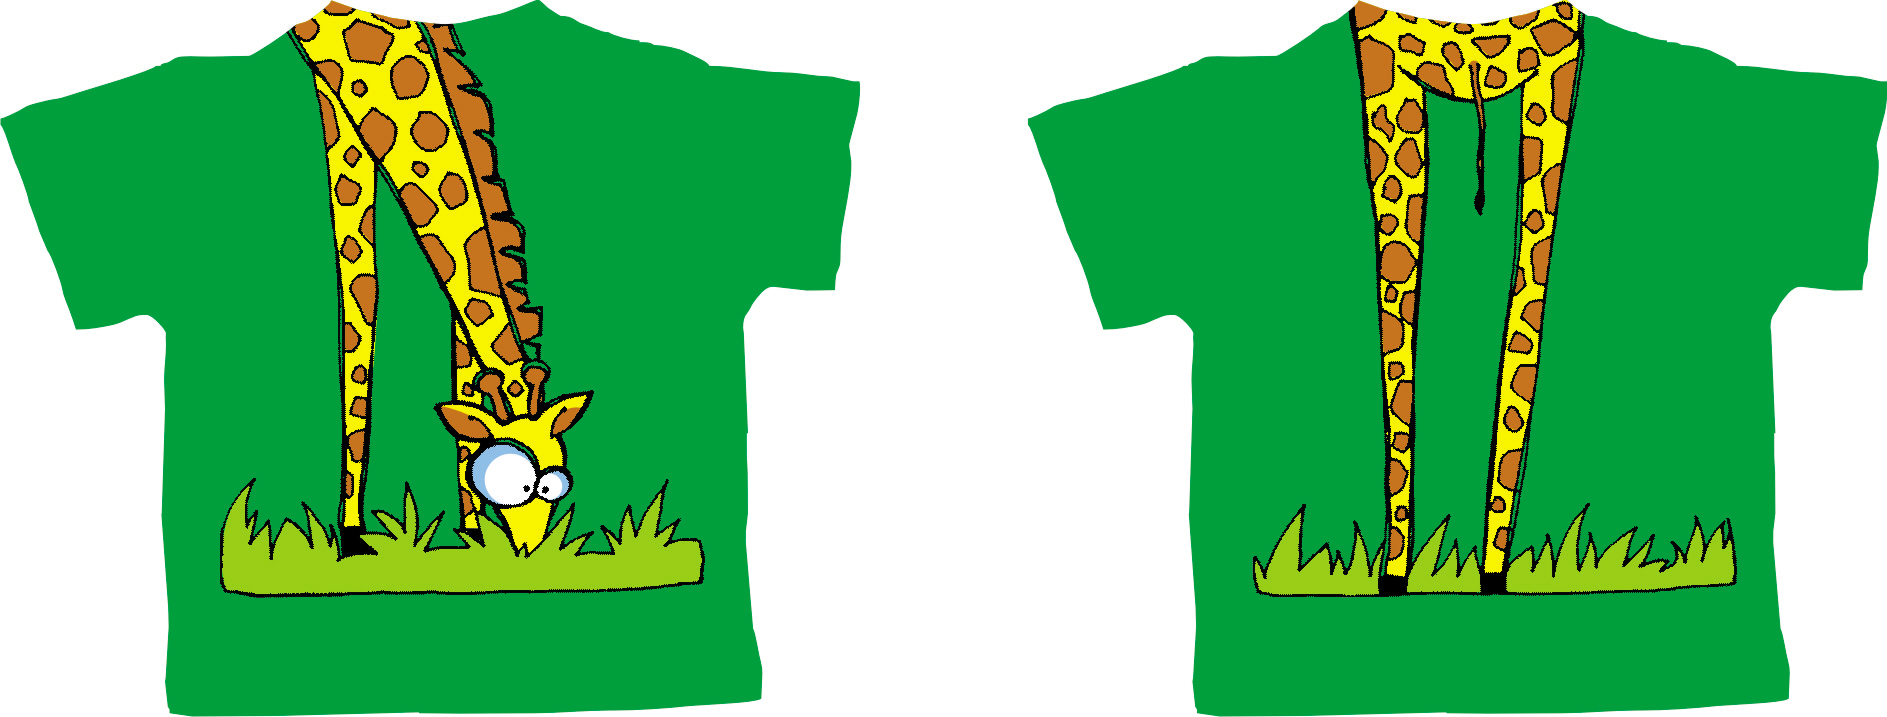 Design t shirt zazzle - Tshirts Tshirt Design Amp Printing Zazzle